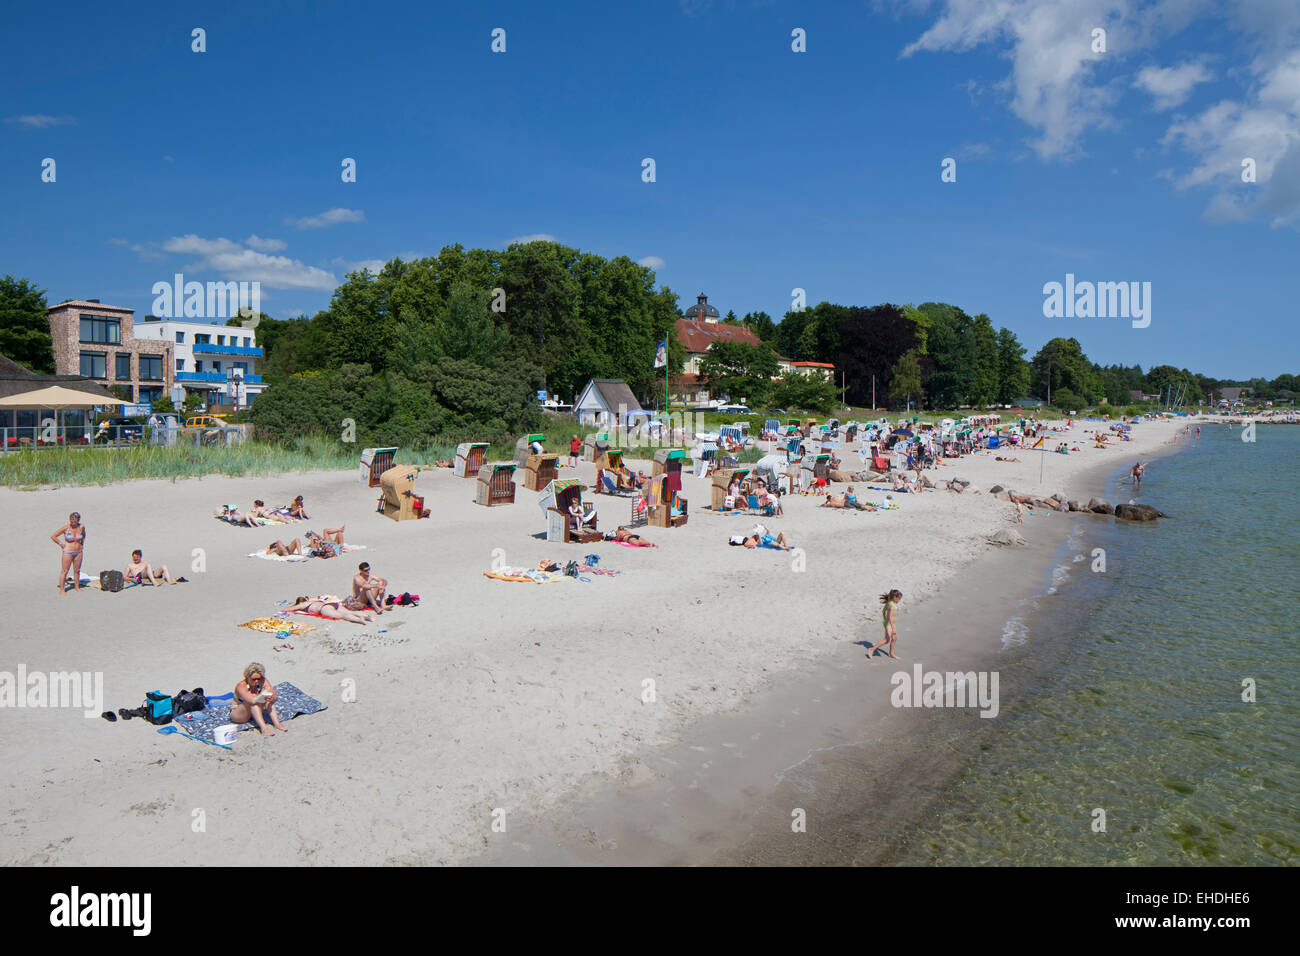 Sunbathers in beach chairs at the seaside resort Haffkrug, Schleswig-Holstein, Germany - Stock Image